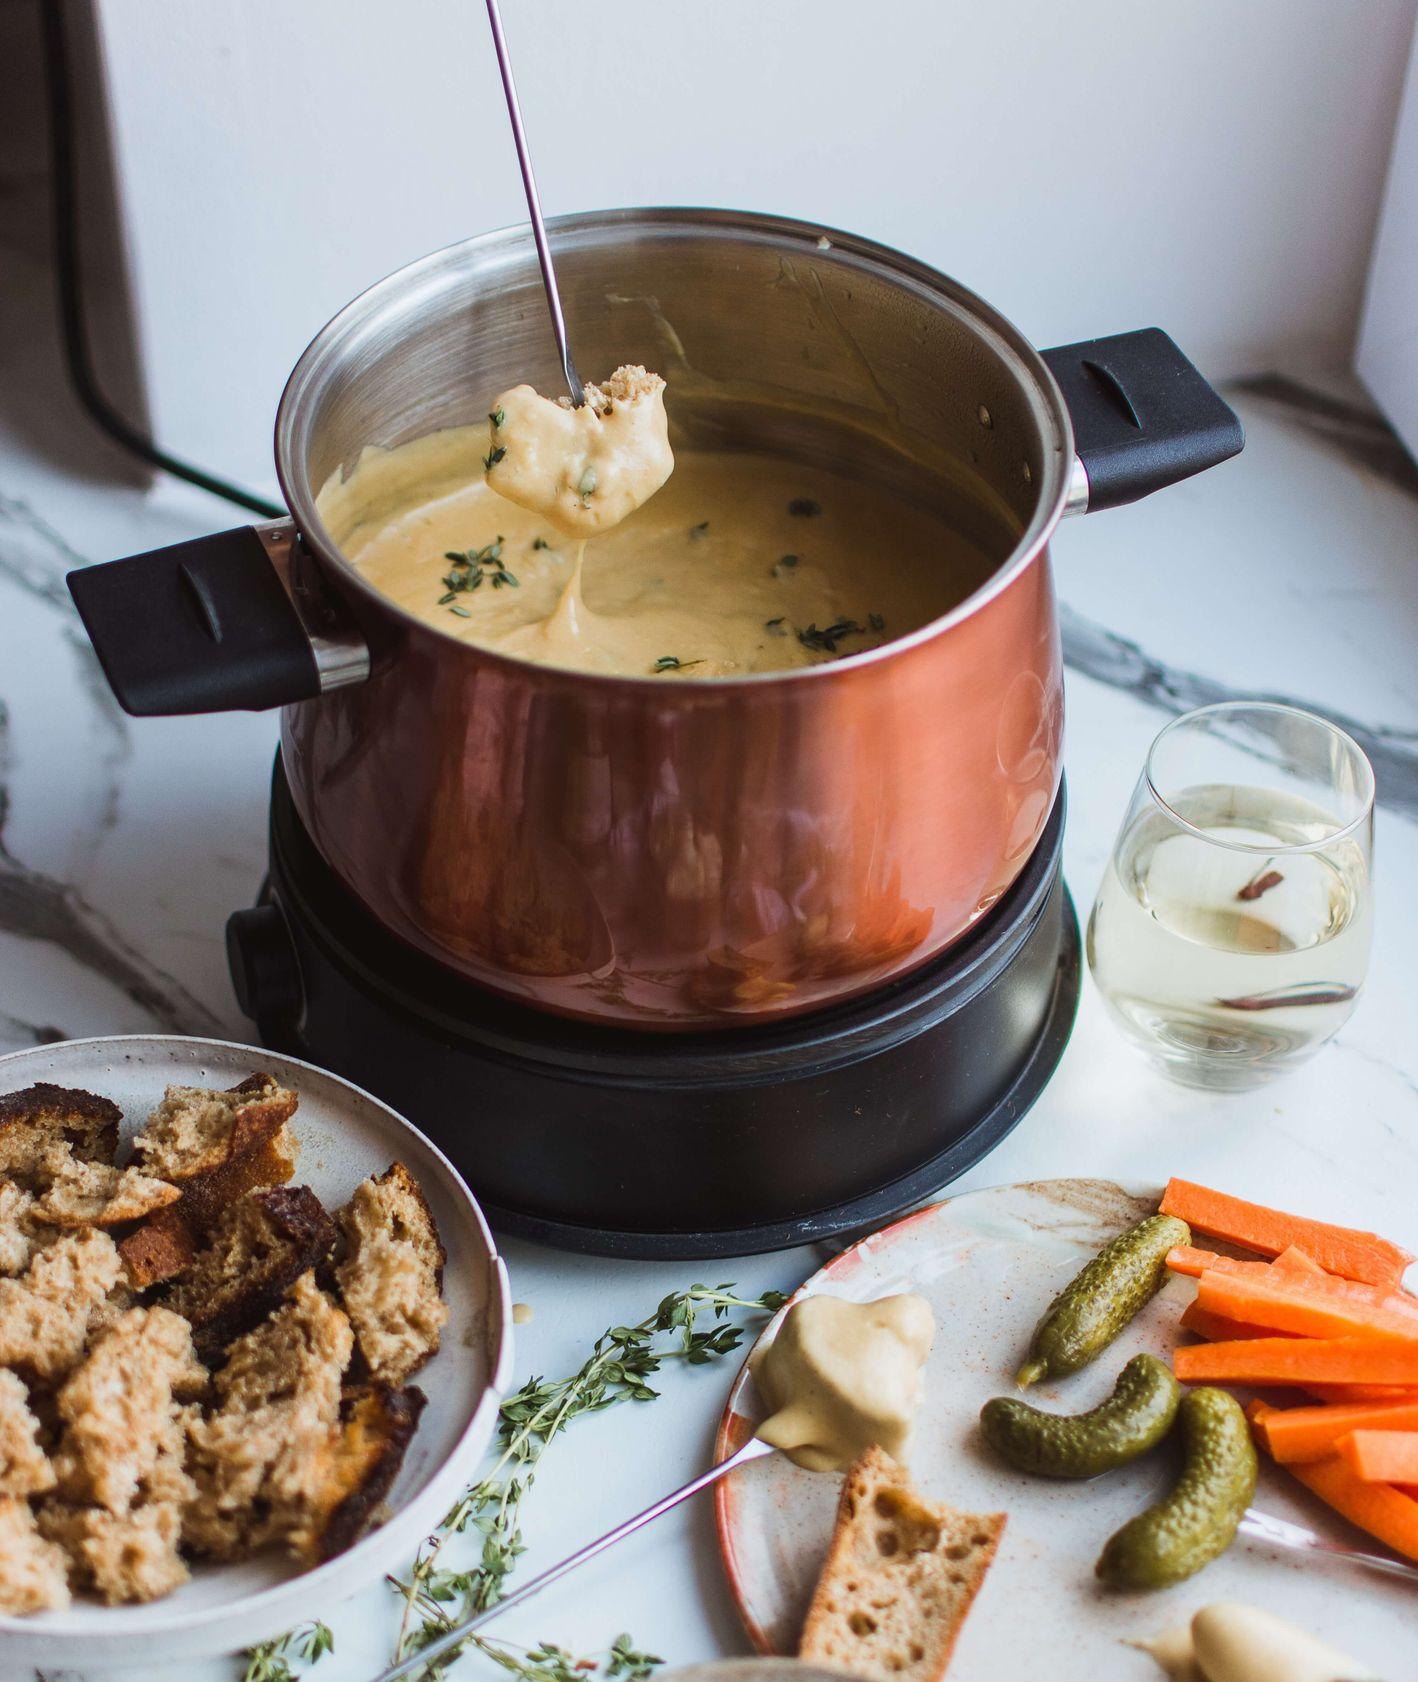 Fondue serowe z mięsem i warzywami (fot. Klara Avsenik / unsplash.com)